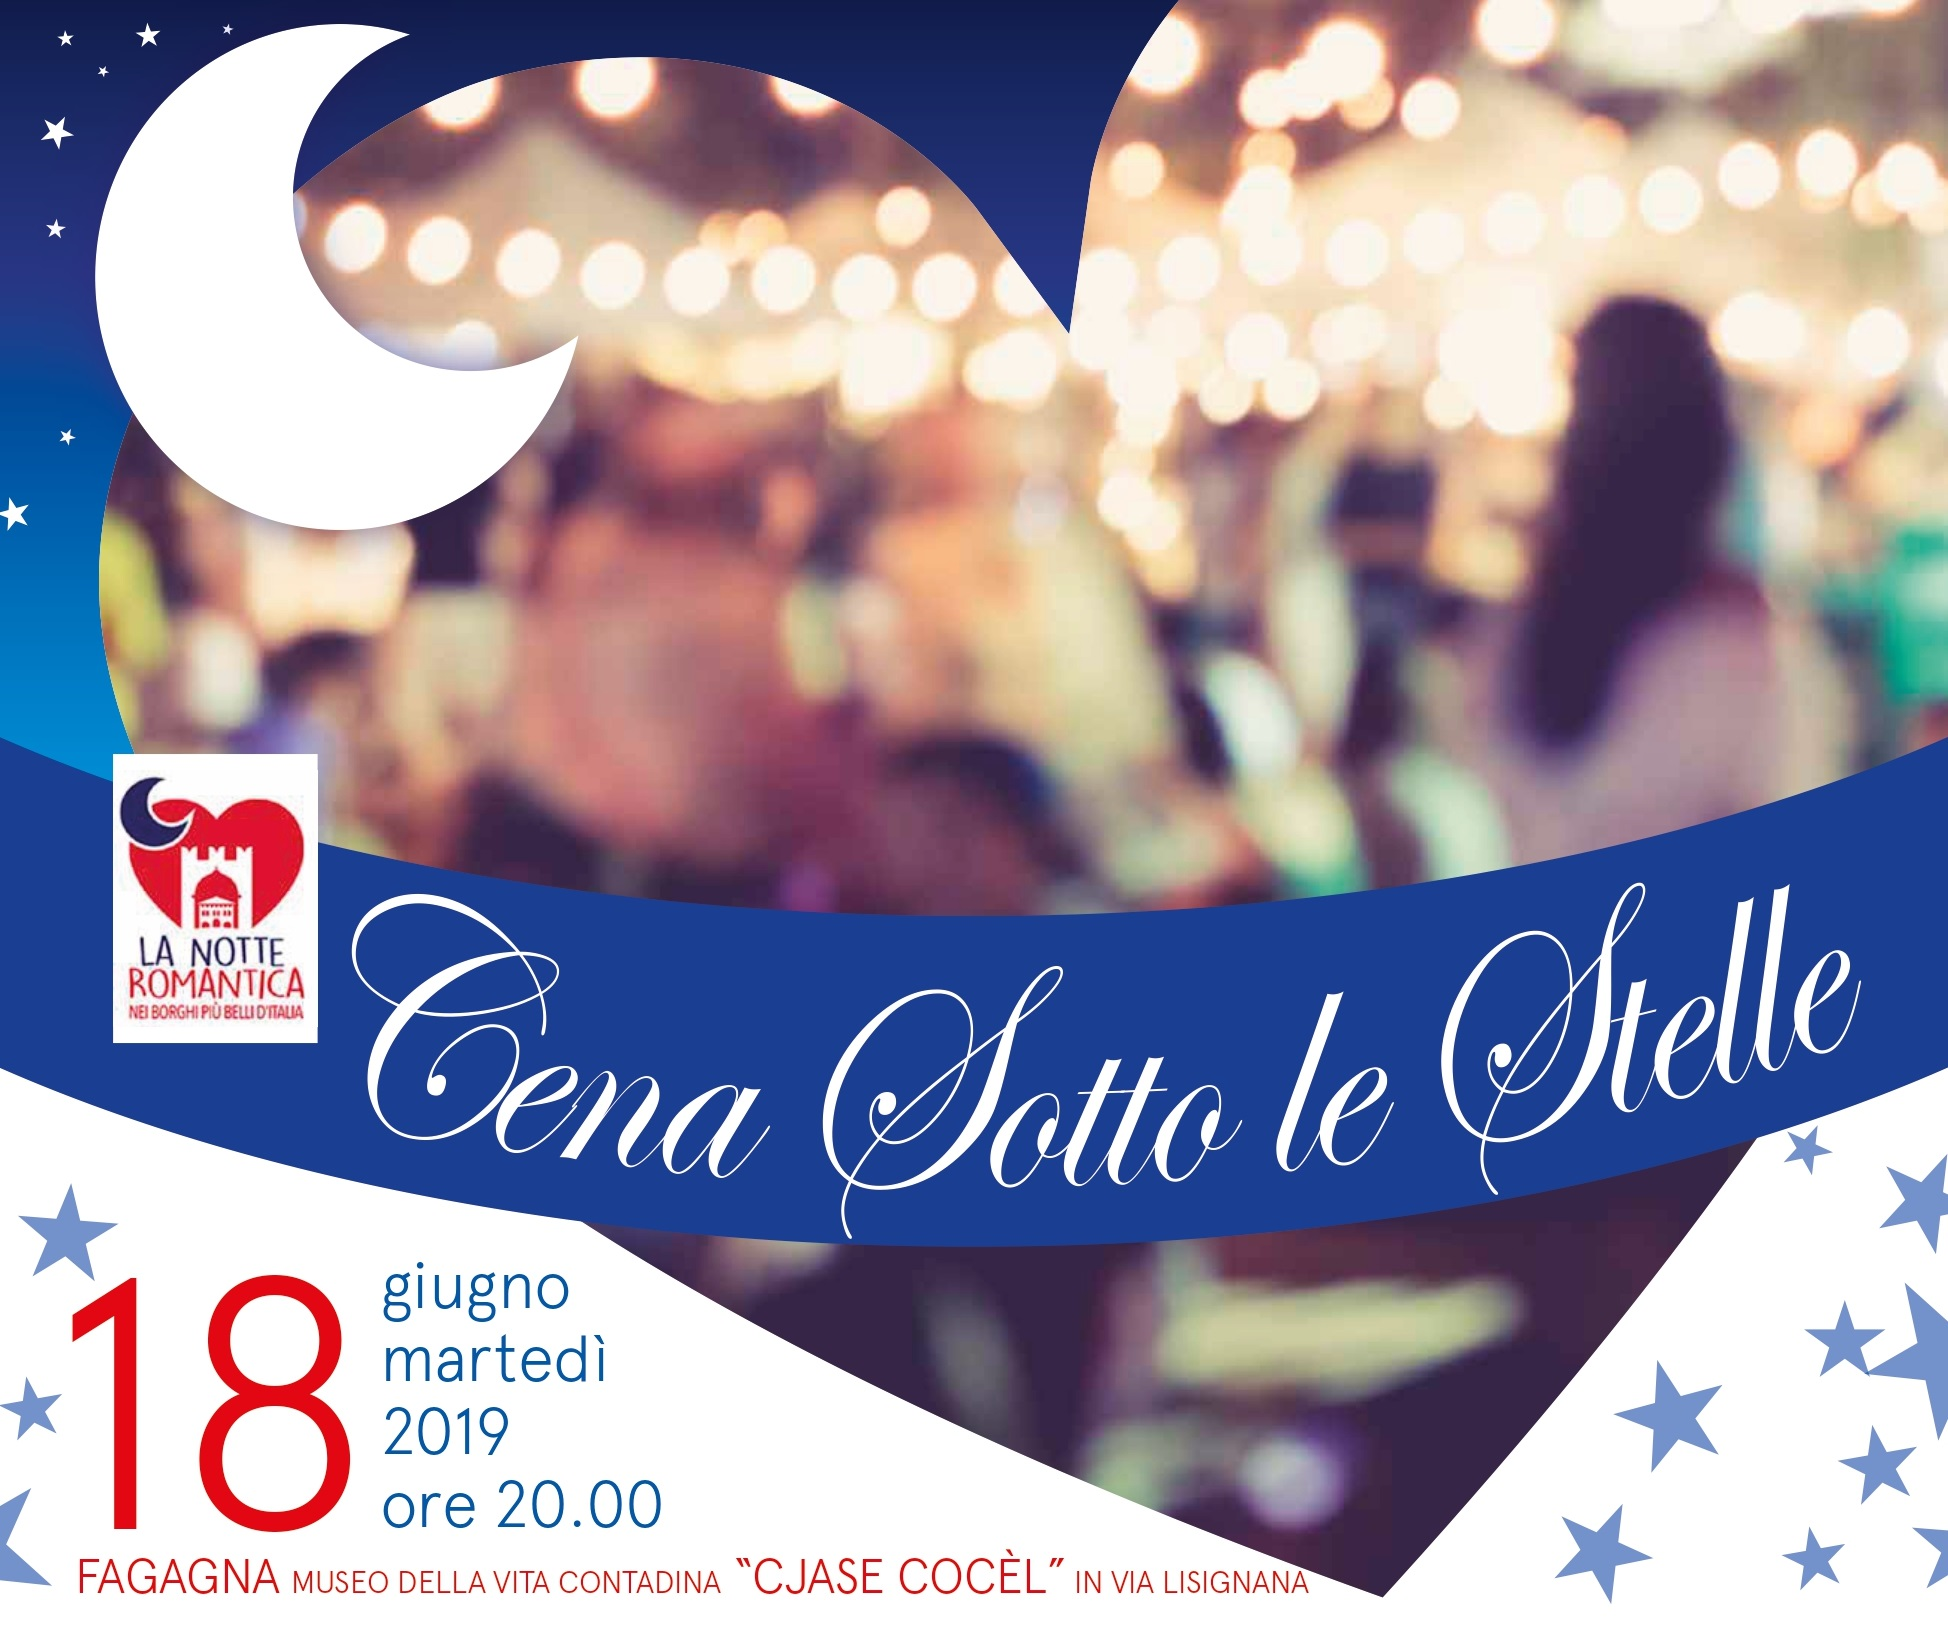 Cena Sotto le Stelle 2019 - Fagagna - Borghi belli FVG